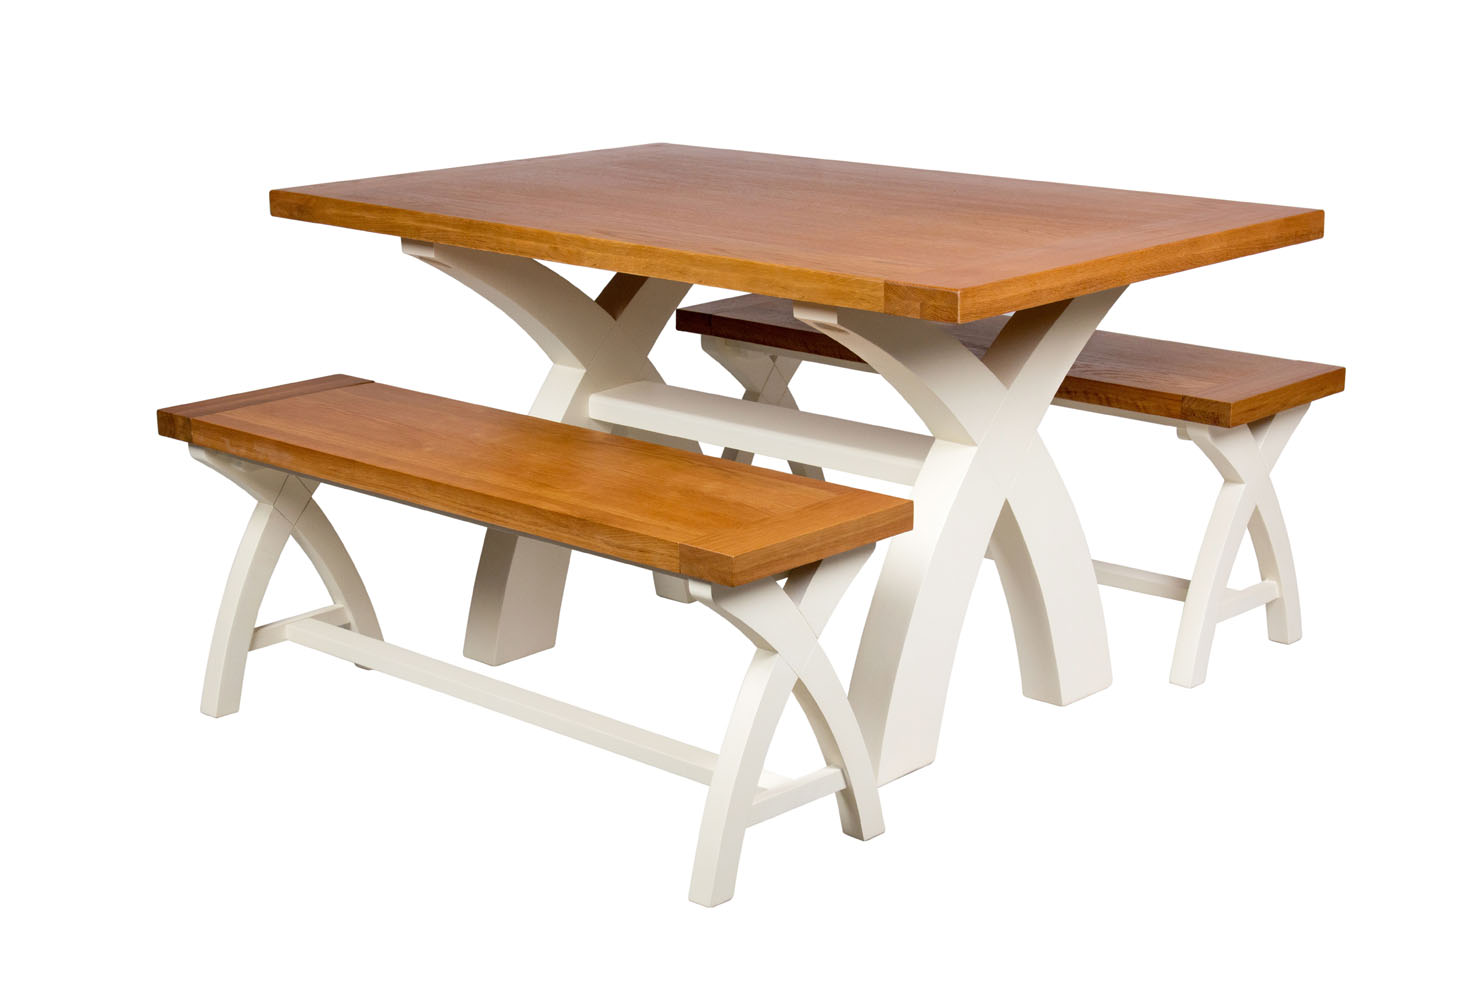 Swell Country Oak 140Cm Cream Painted Cross Leg Table 2 120Cm Cross Leg Cream Bench Set Black Friday Sale Dailytribune Chair Design For Home Dailytribuneorg